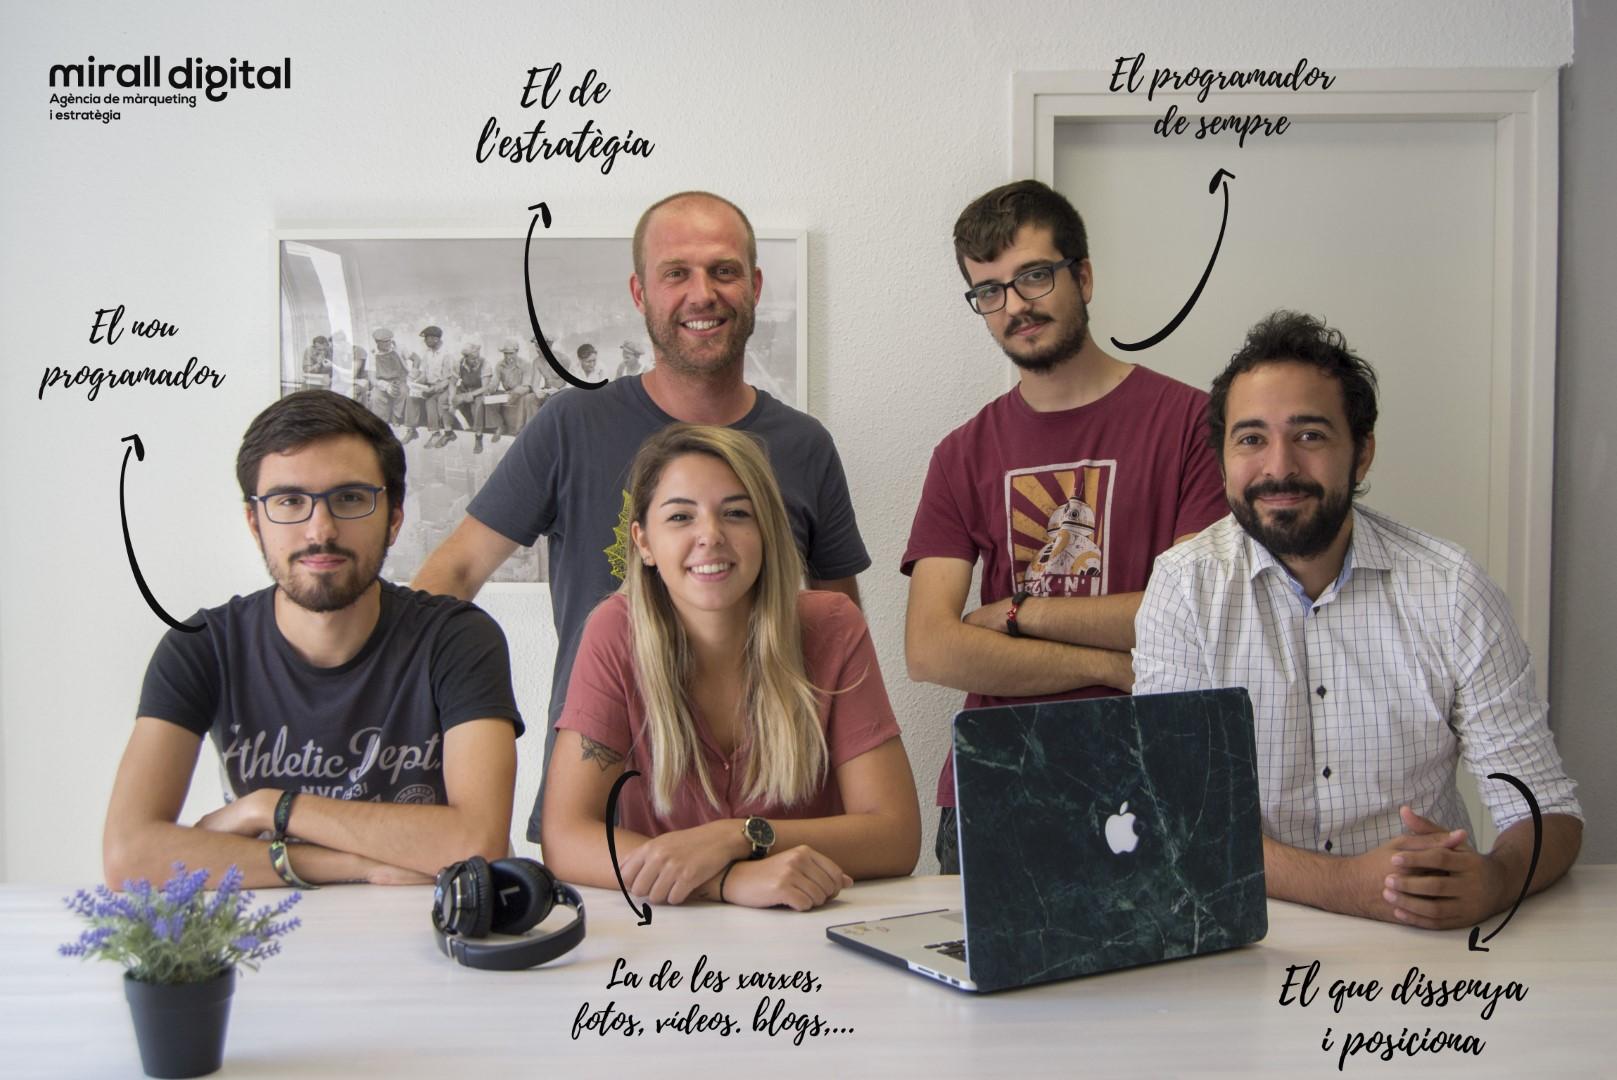 Mirall digital equip 2019